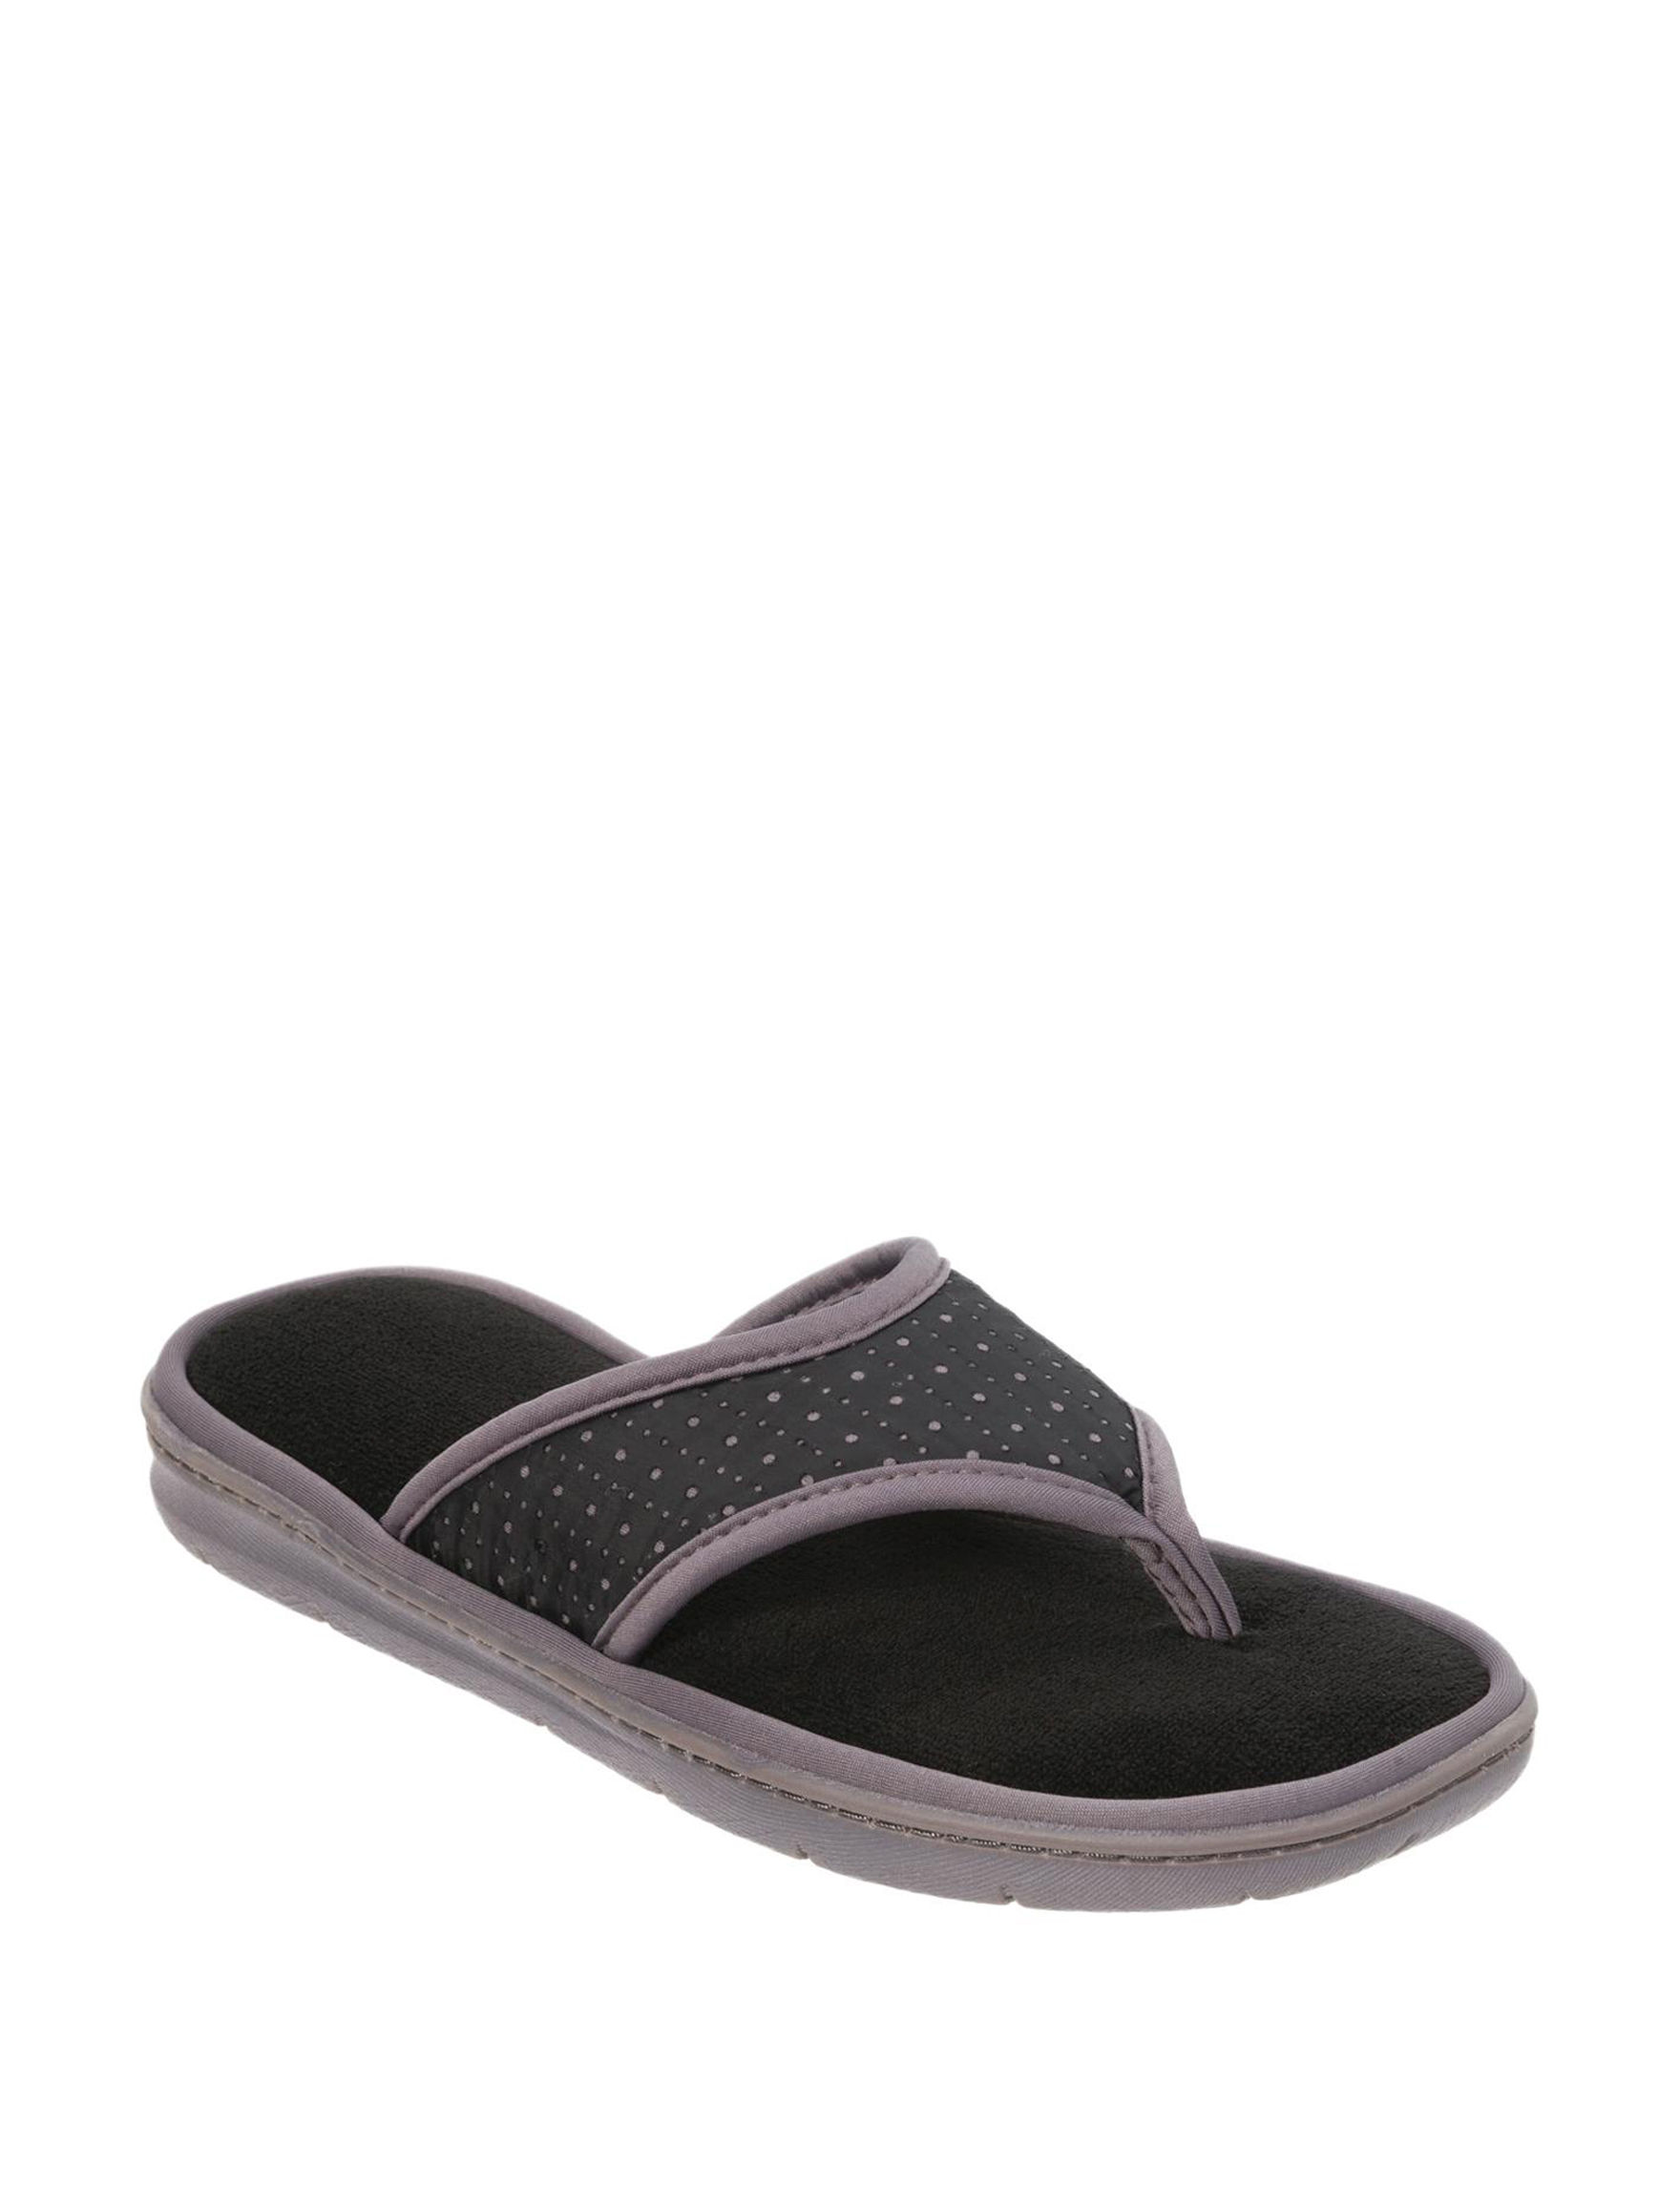 Dearfoams Black Slipper Sandals